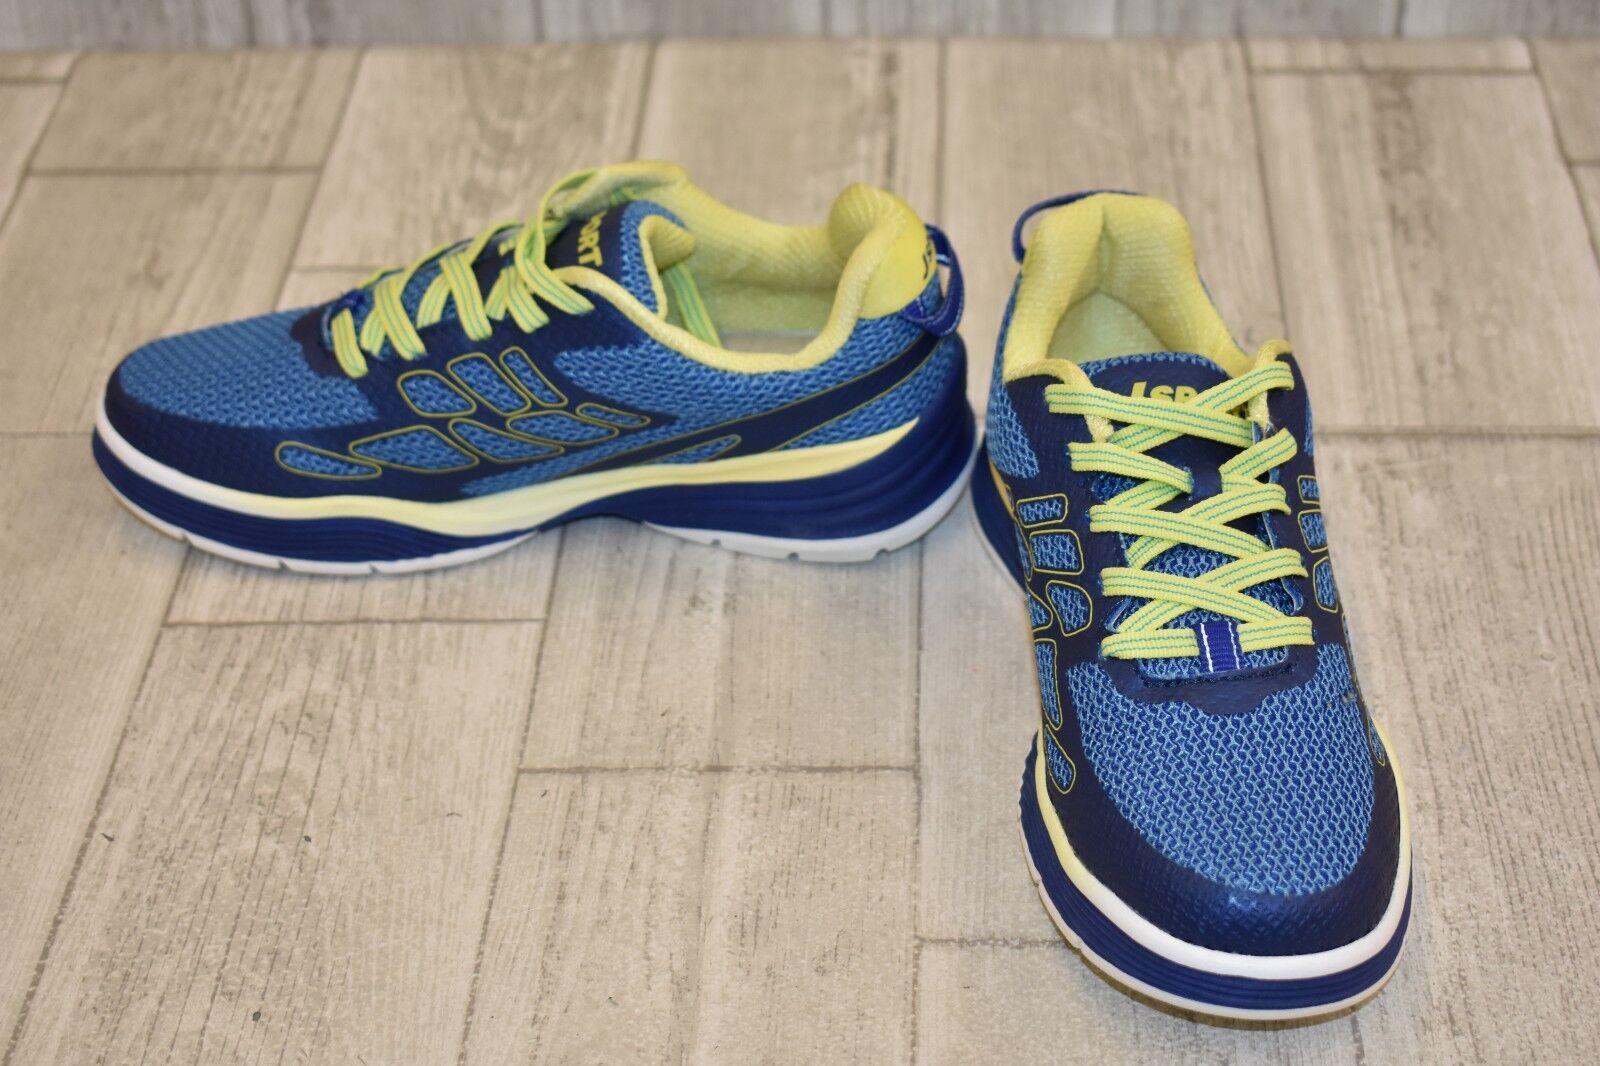 JSport by Jambu Sport Walker Shoes - Women's Size 6M, Deep B